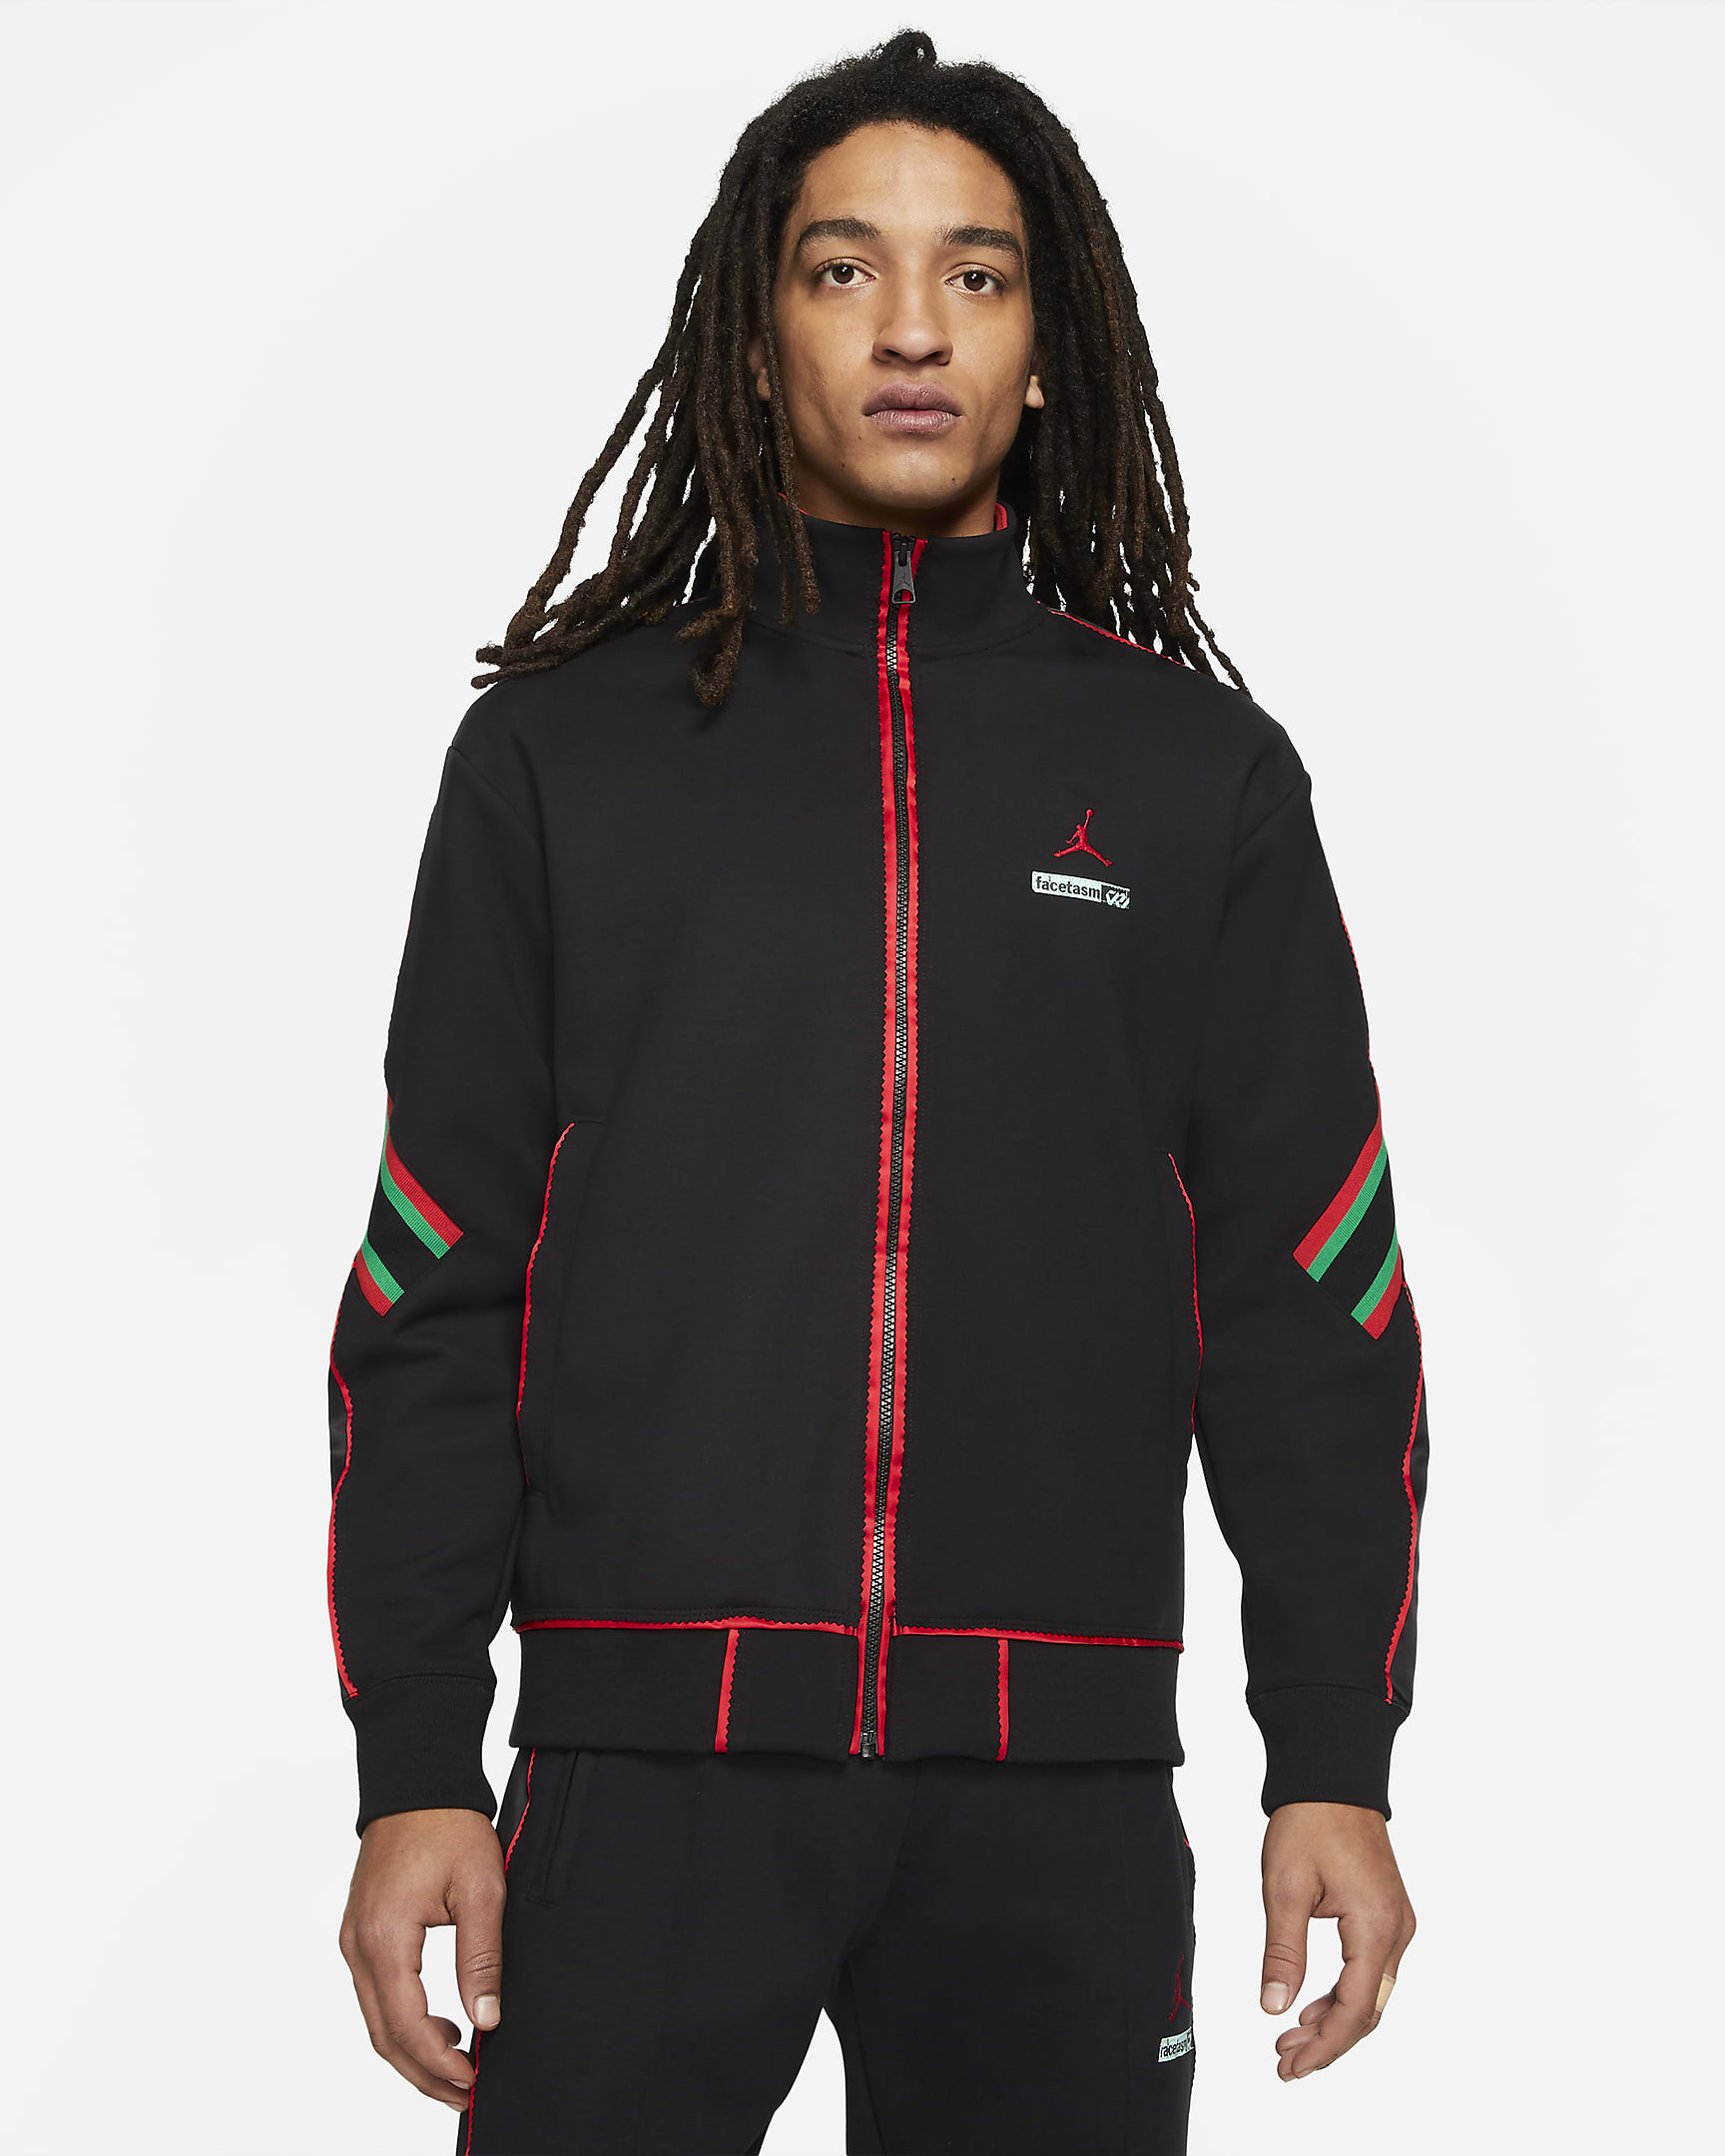 jordan-why-not-x-facetasm-mens-track-jacket-CmdpQ2